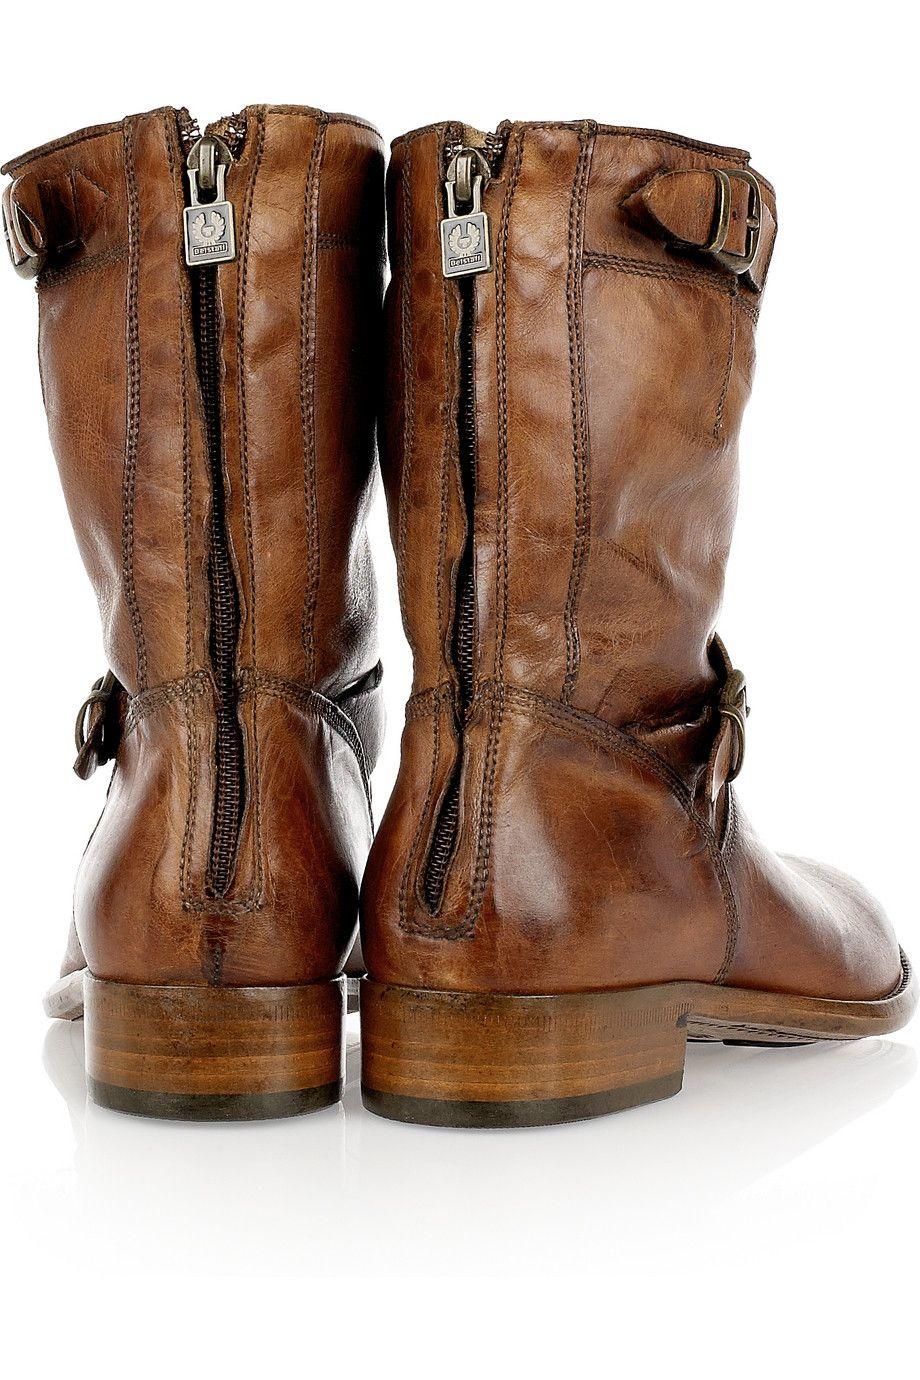 FOOTWEAR - Boots Belstaff UPREC